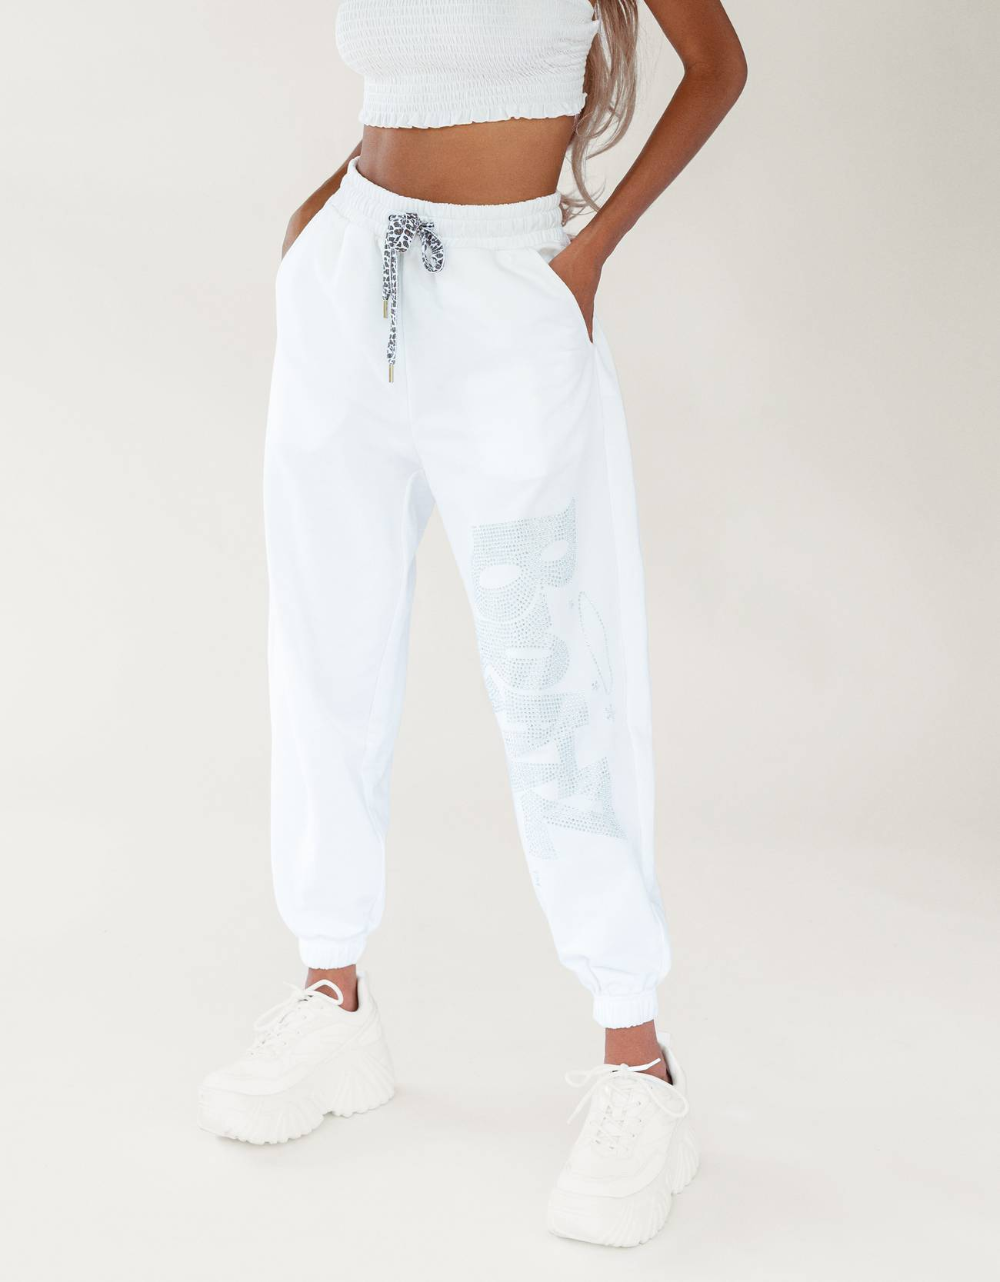 Bershka Pantalon Chandal Mujer 55 Descuento Gigarobot Net